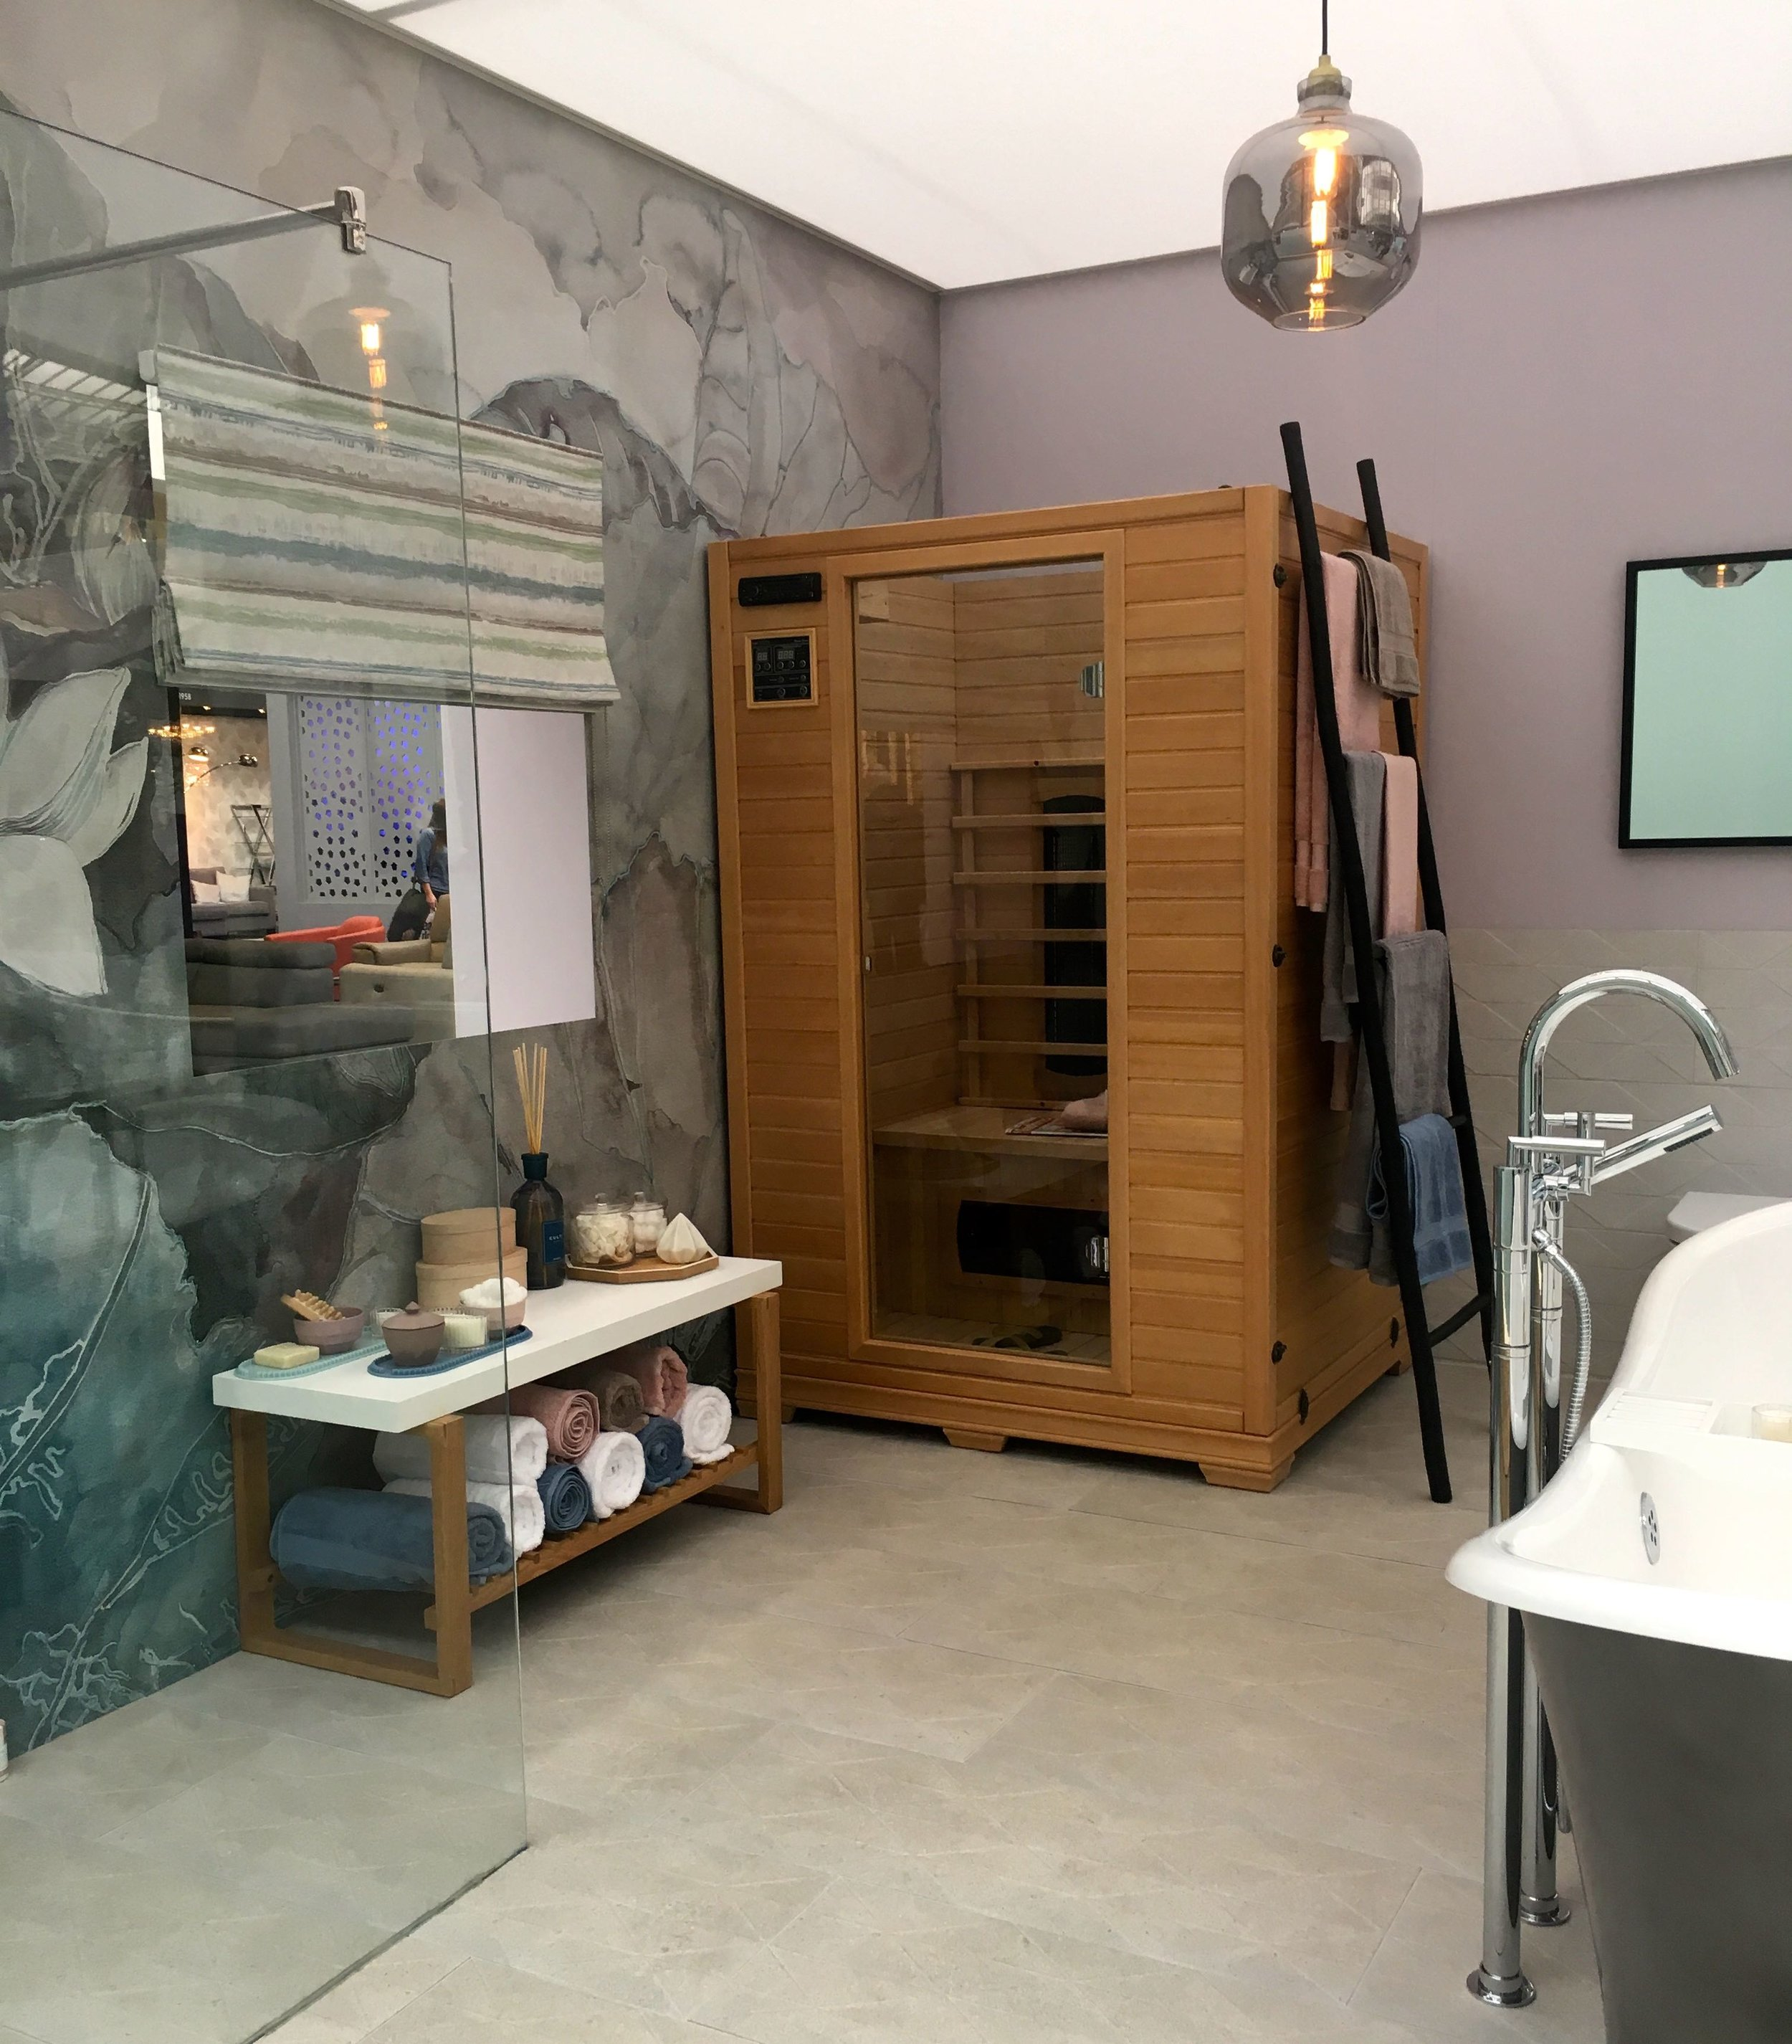 A sauna in the corner of the wellness bathroom roomset